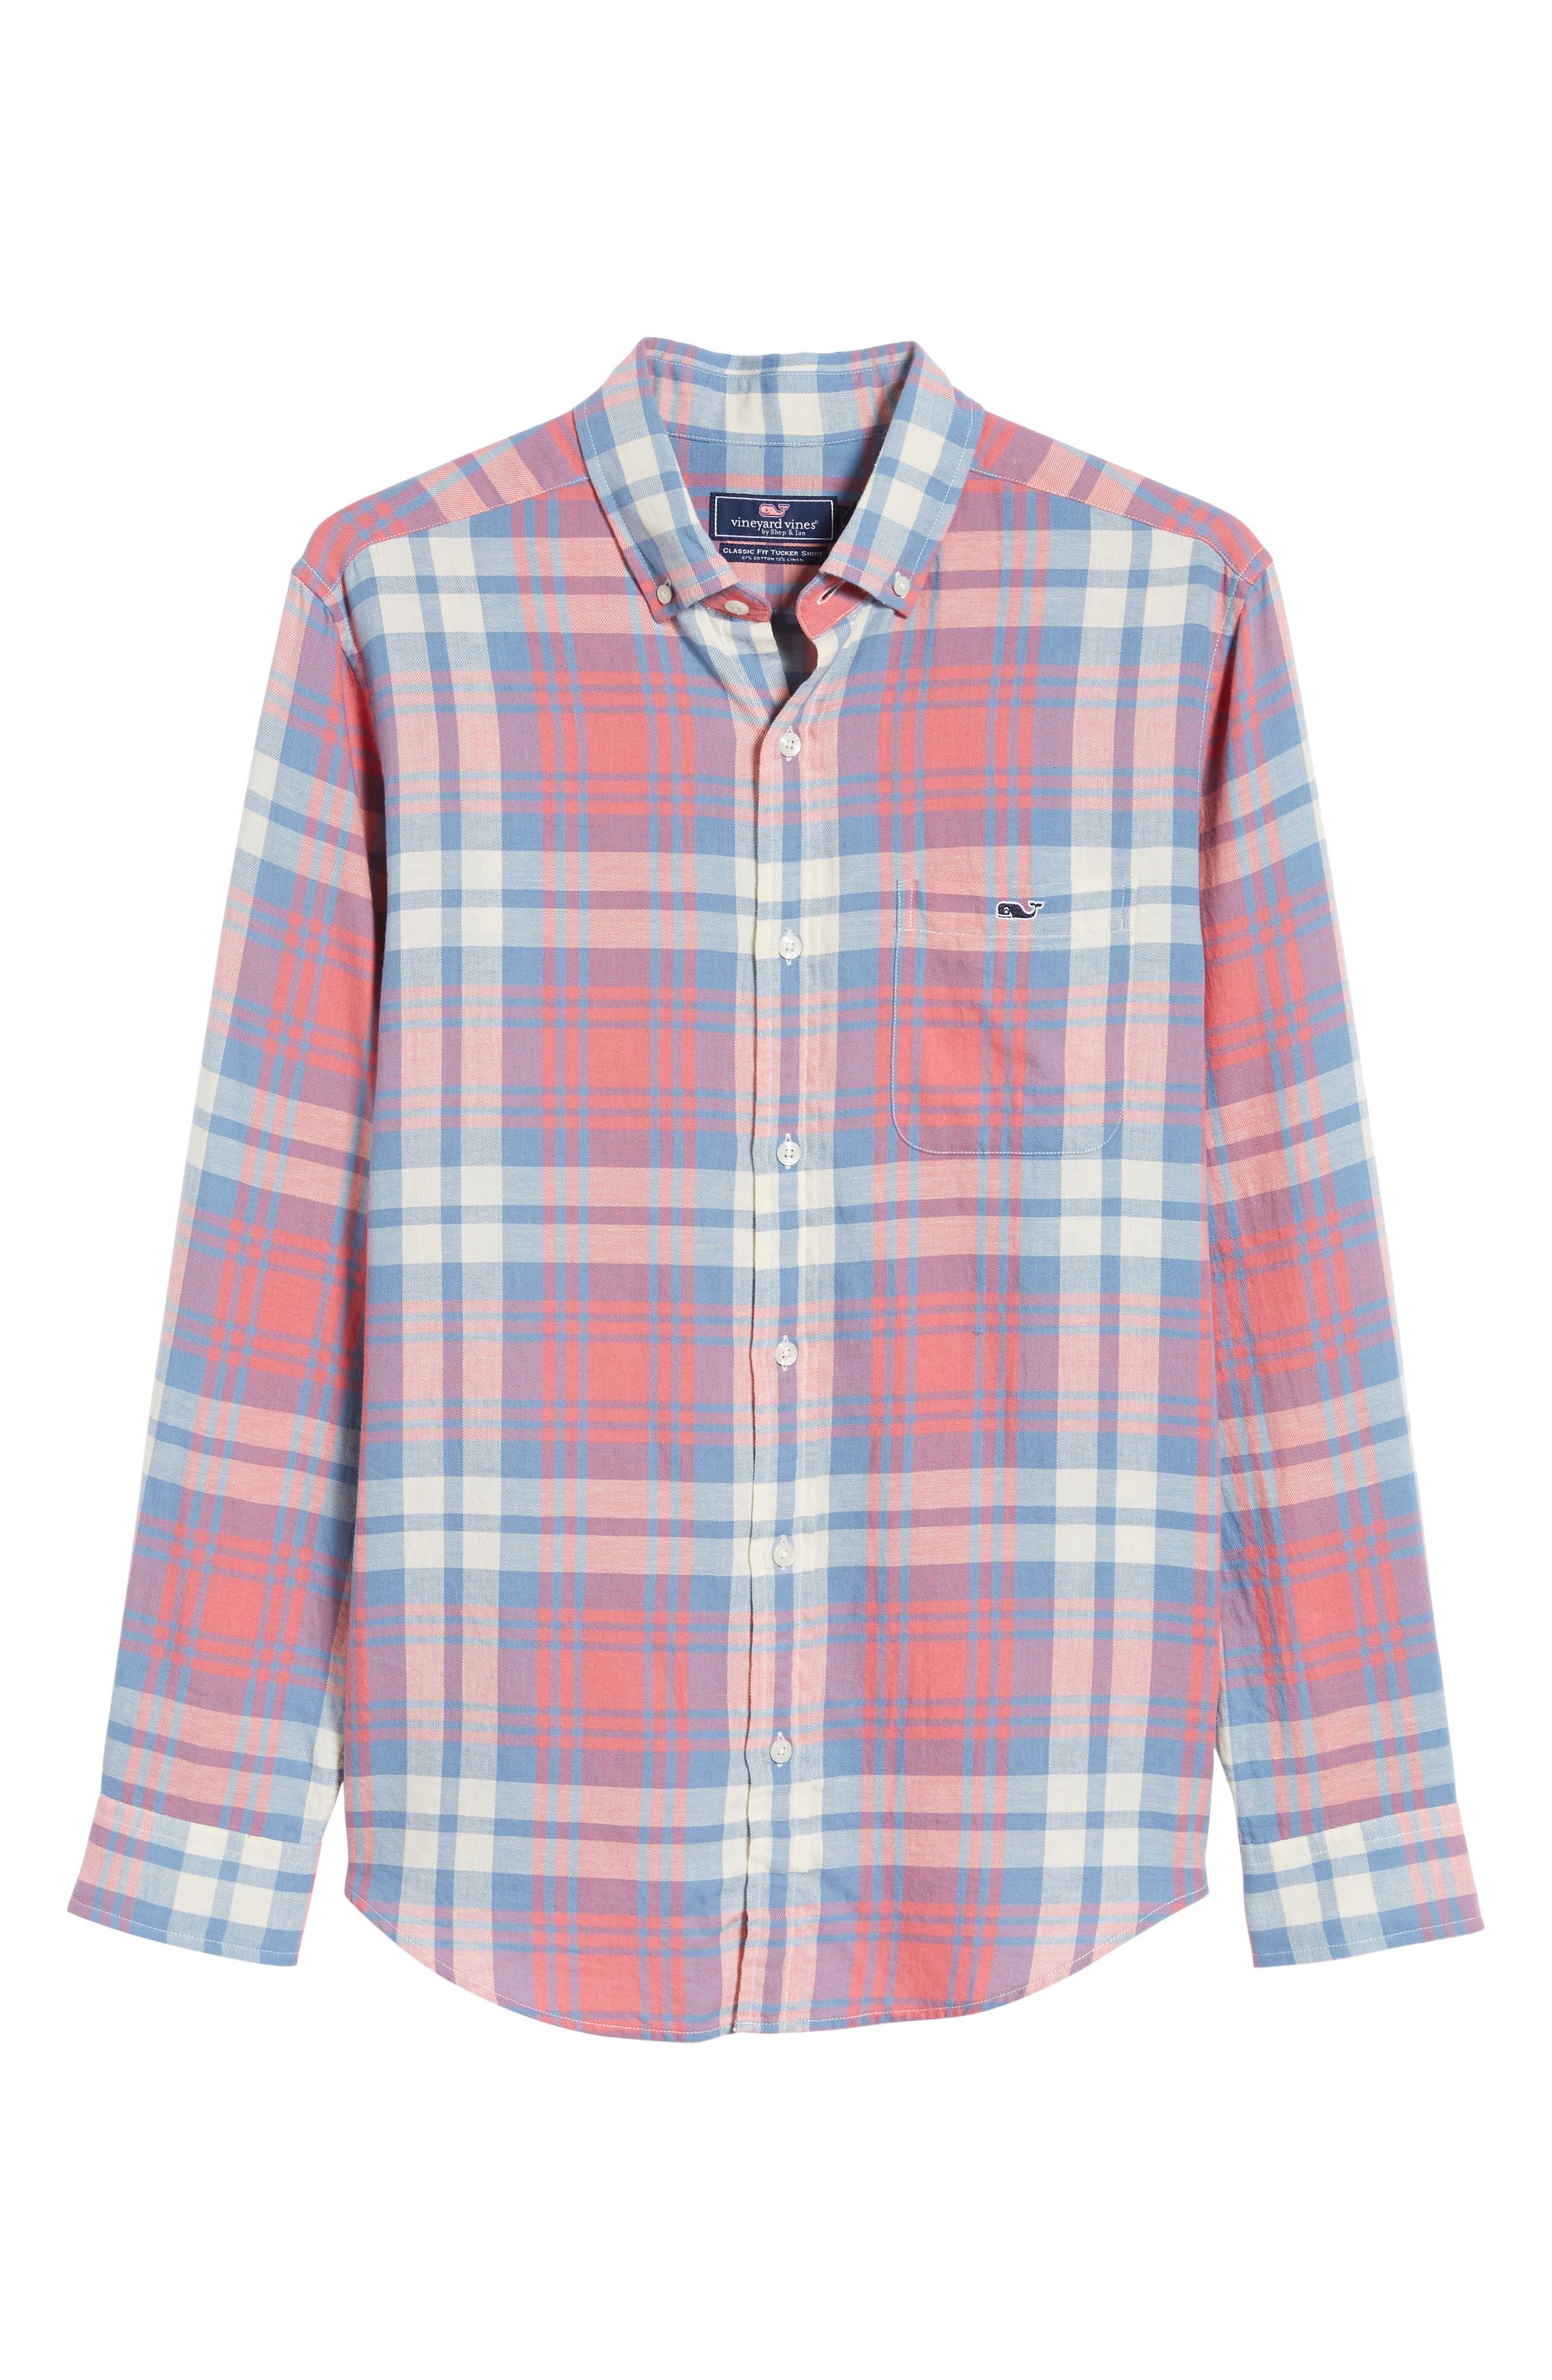 VINEYARD VINES, Kings Point Slim Fit Tucker Sport Shirt, Alternate thumbnail 5, color, LOBSTER REEF